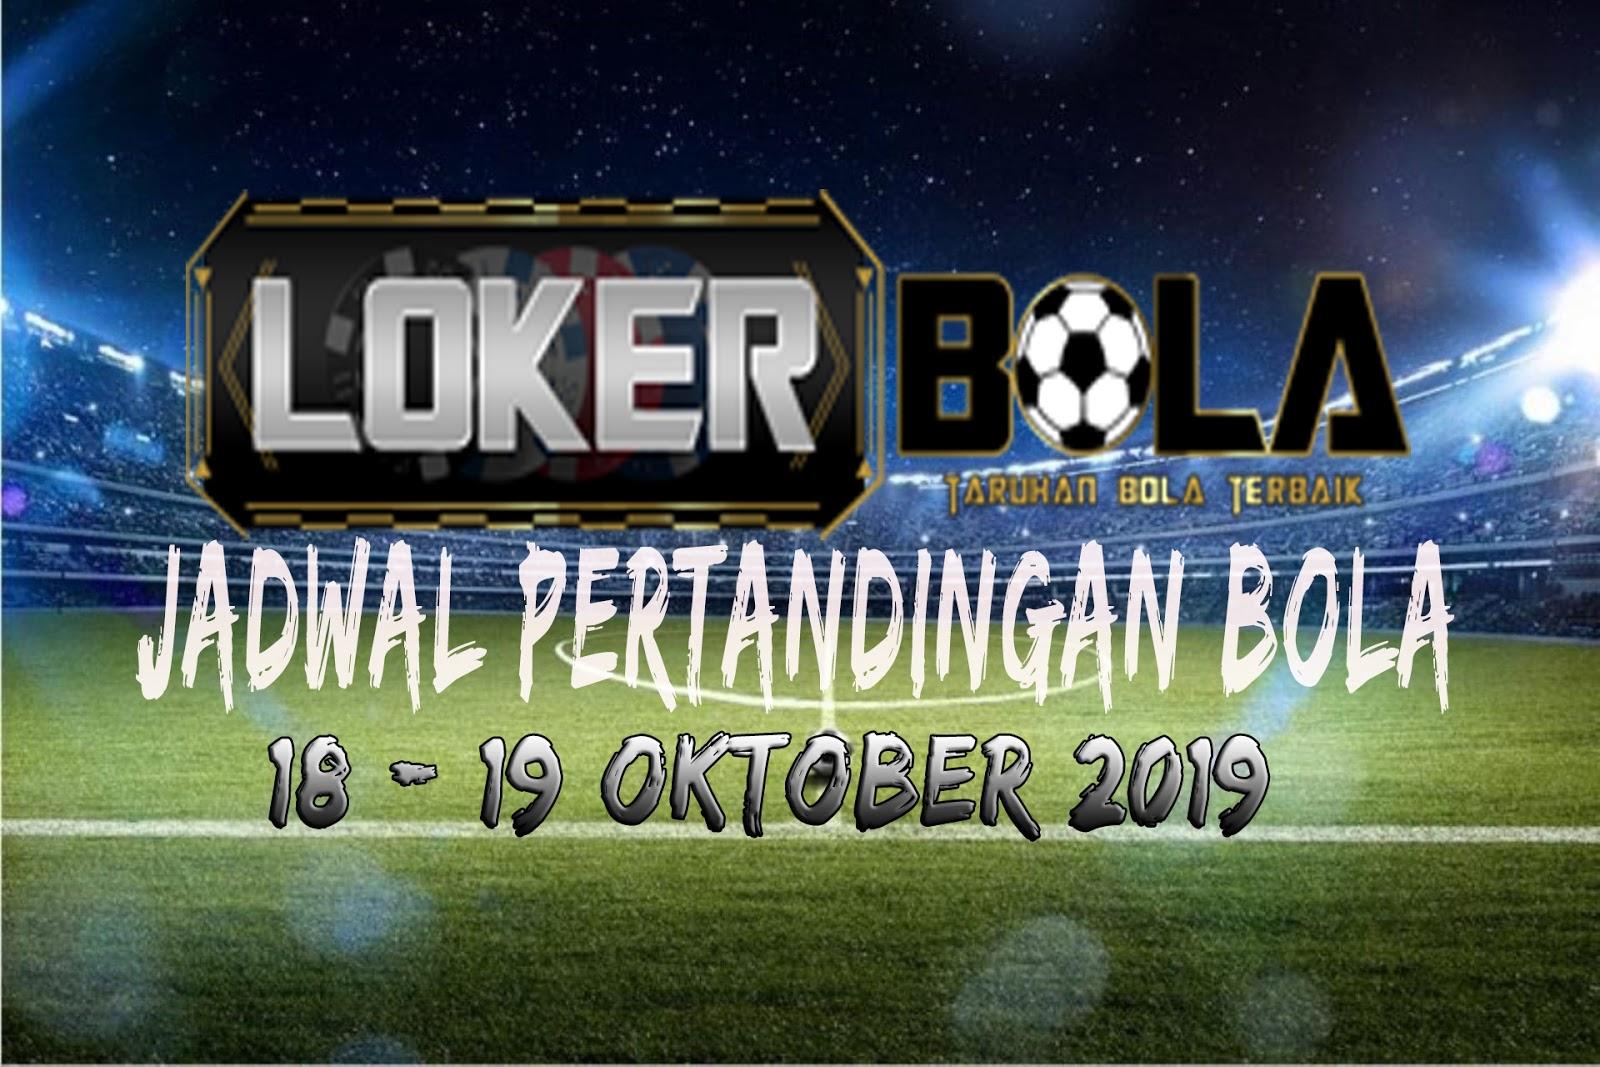 JADWAL PERTANDINGAN BOLA 18 – 19 OKTOBER 2019